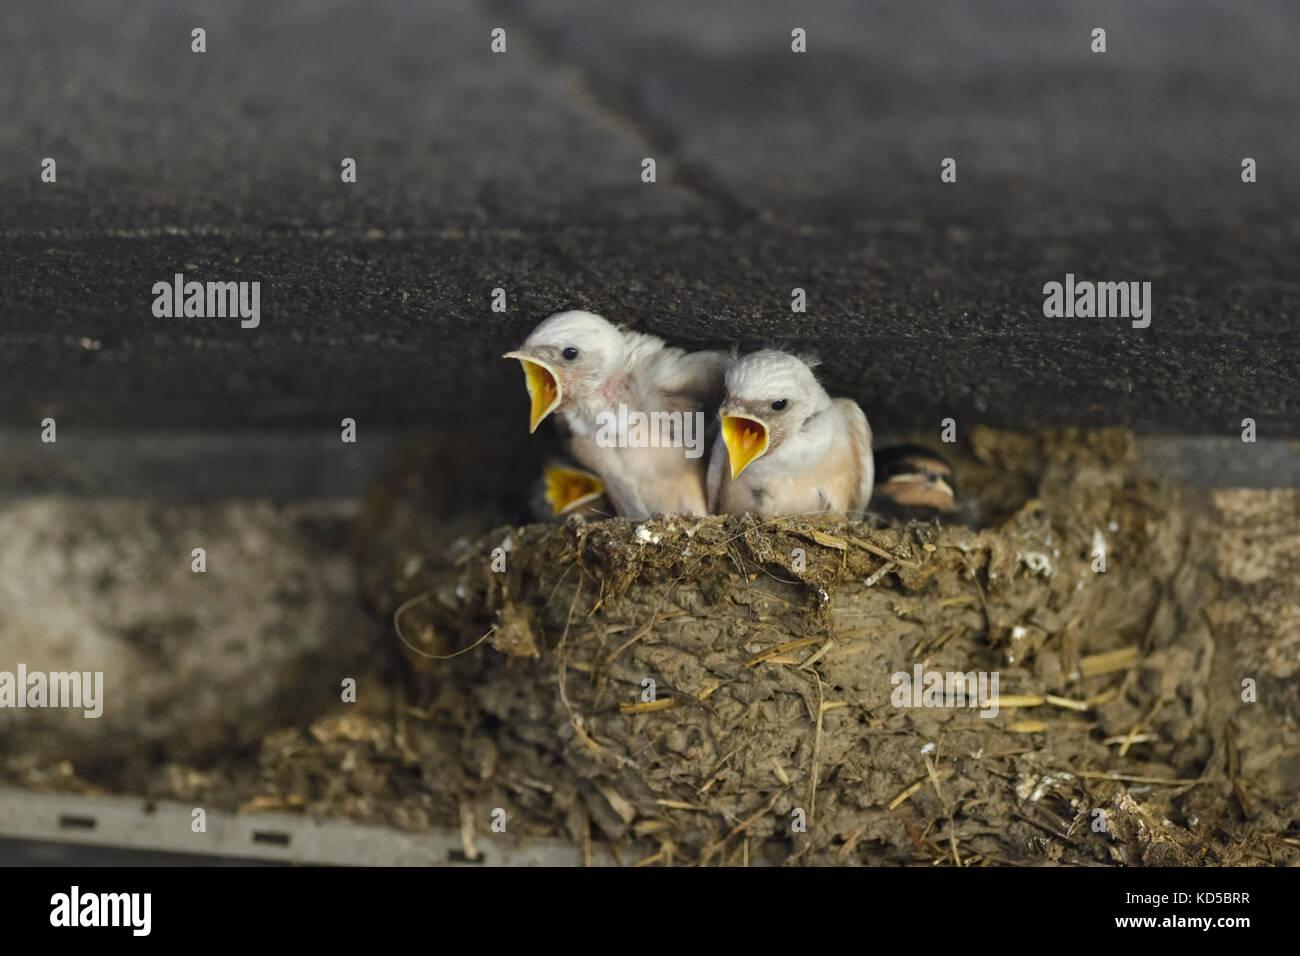 Barn Swallows / Rauchschwalben ( Hirundo rustica ), leucistic chicks in nest, white plumage, rare pigment defect, - Stock Image